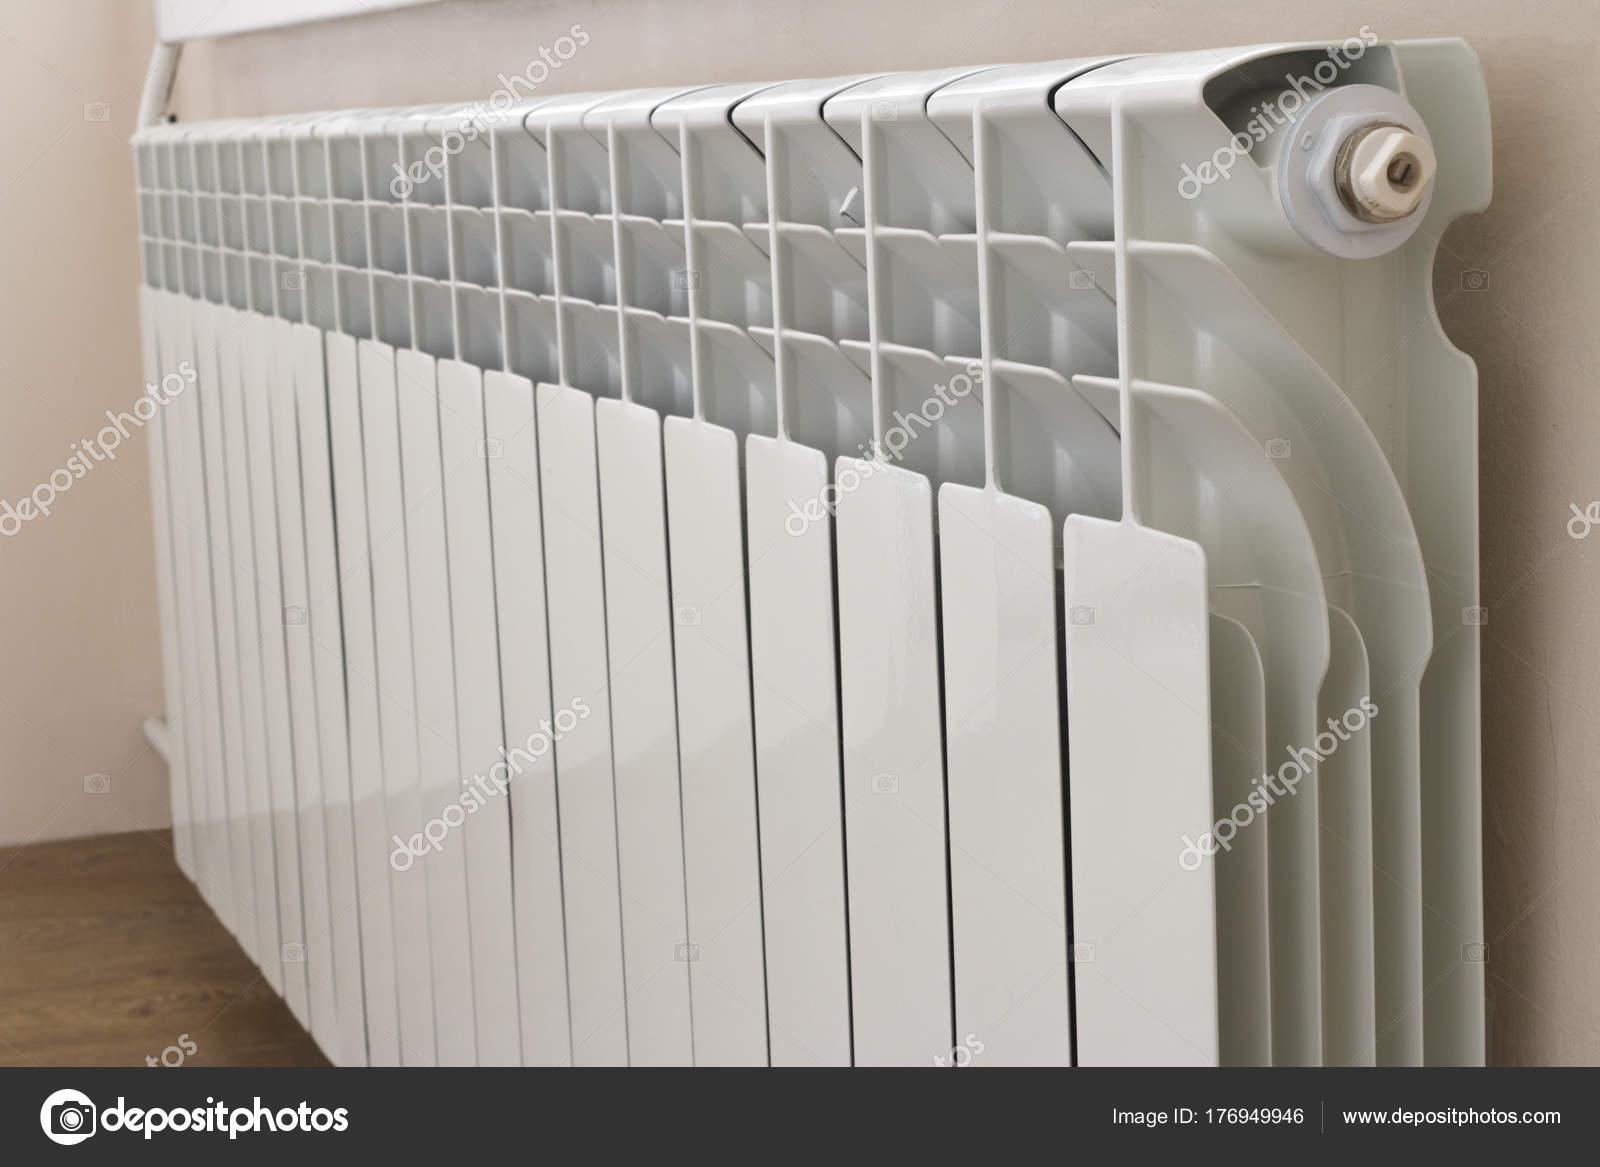 Fabulous Aluminium-Heizkörper — Stockfoto © Ibraman3012 #176949946 RG37